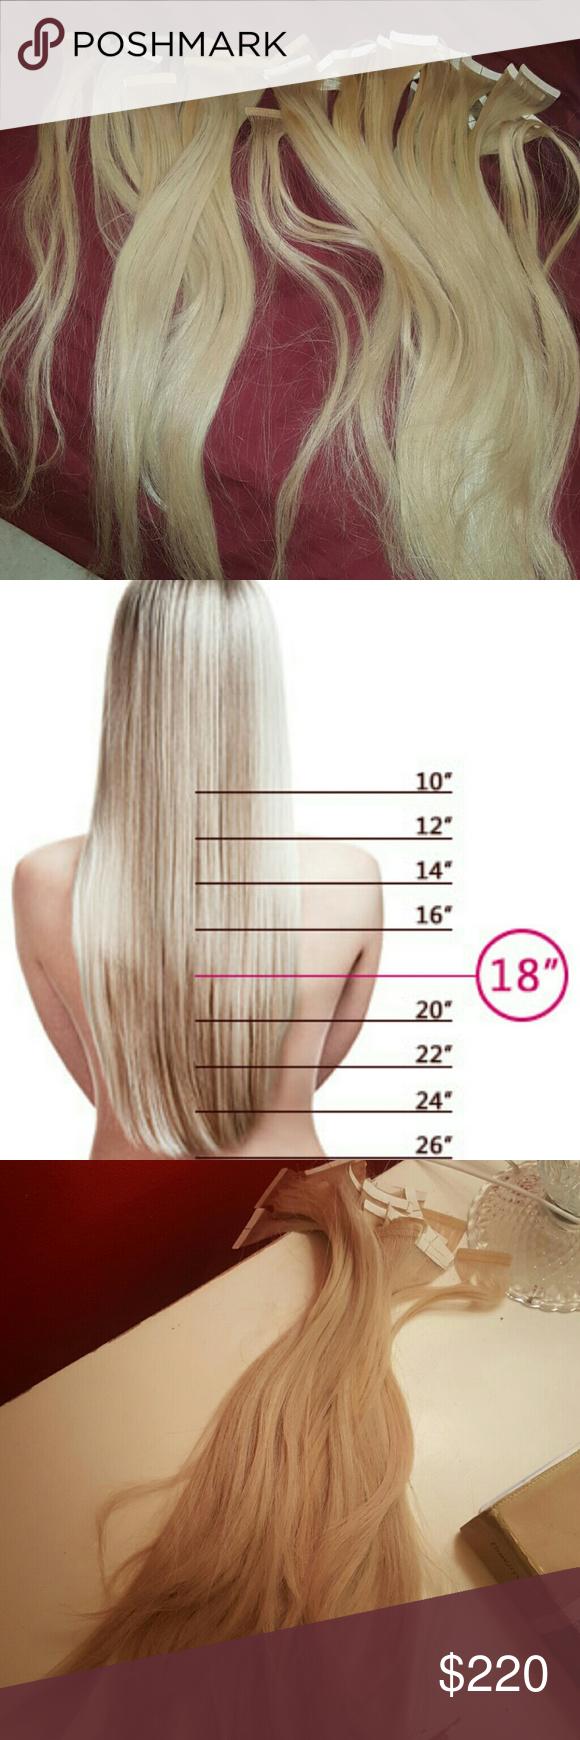 Blonde Babe Hair Extensions Hair Pinterest Remy Hair Hair